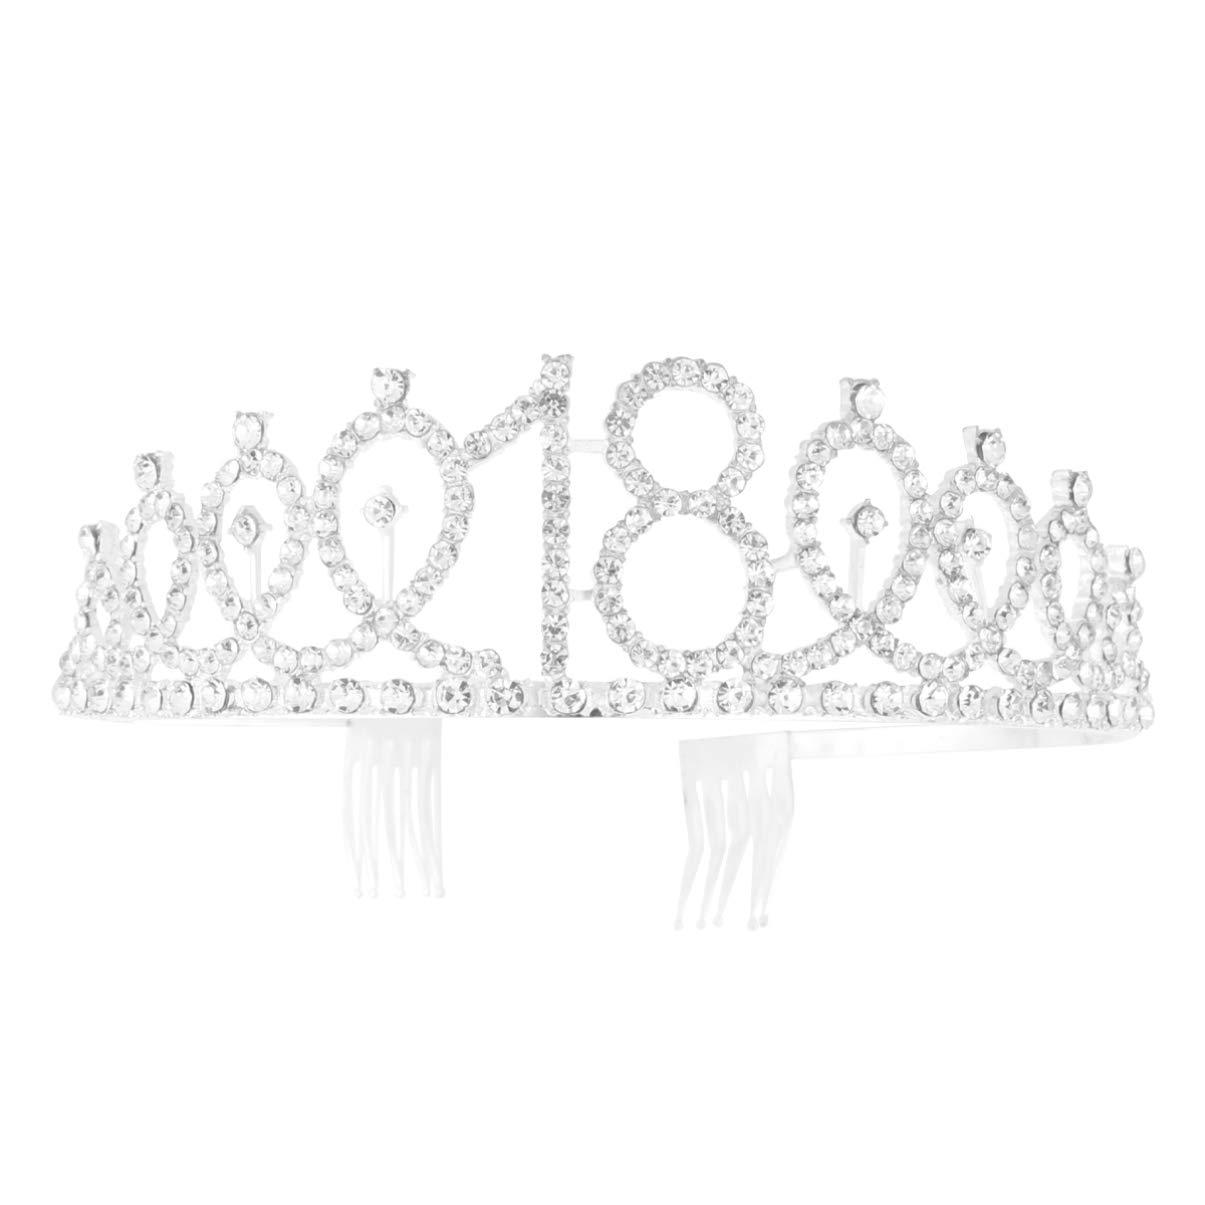 Beaupretty 18th Birthday Crystal Crown Rhinestone Princess Tiara Headband with Hair Comb for Birthday Party Wedding Bridal Decor (Silver)